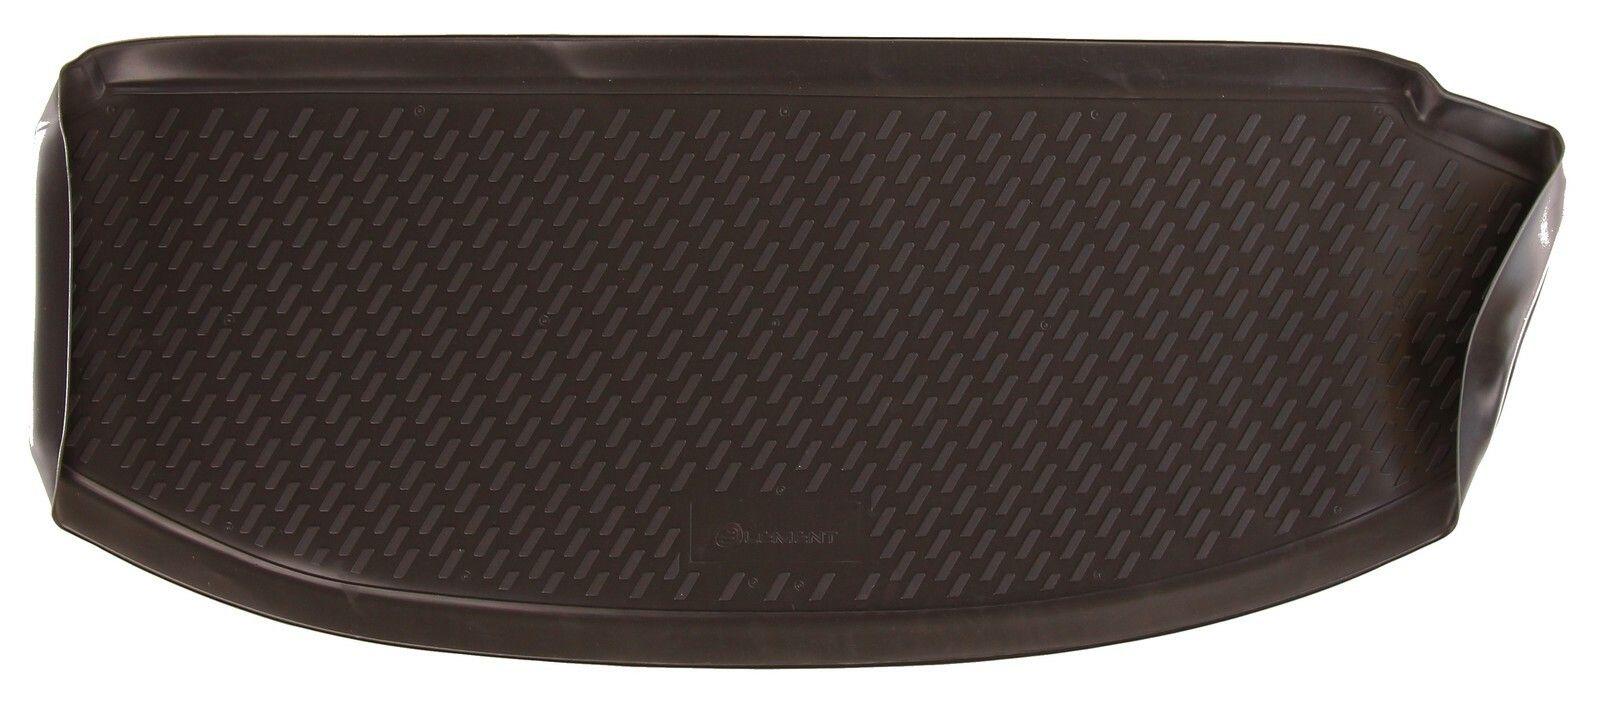 Vana do kufru gumová MAZDA CX-9 2007-> SIXTOL